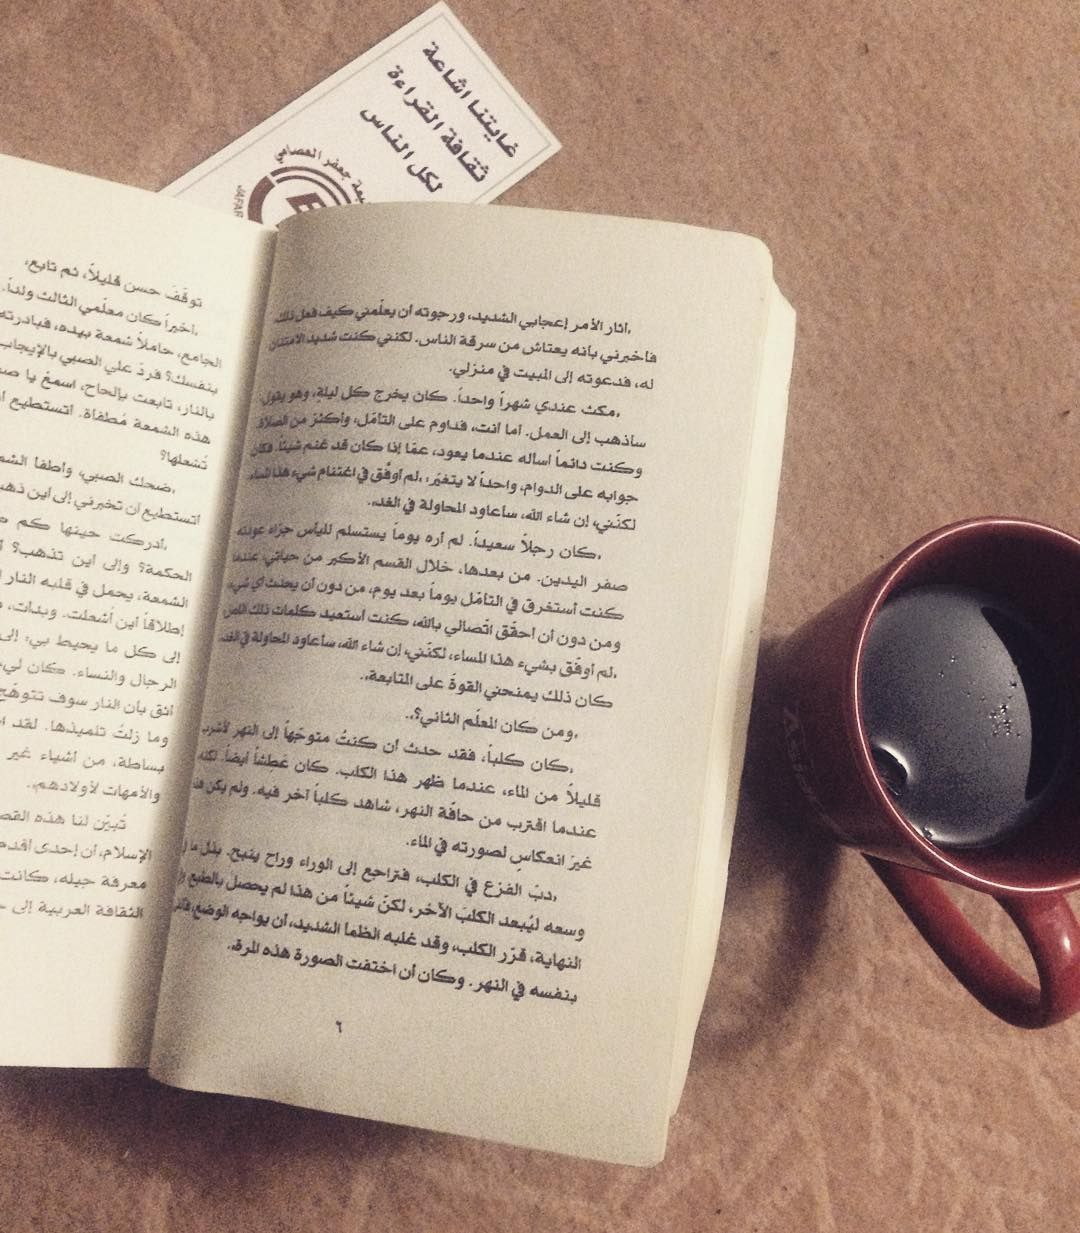 Ali Ayad On Instagram السهر الأنيق كتاب قراءة ثقافة القراءة شاي قهوة سهر Instagram Posts Instagram Post